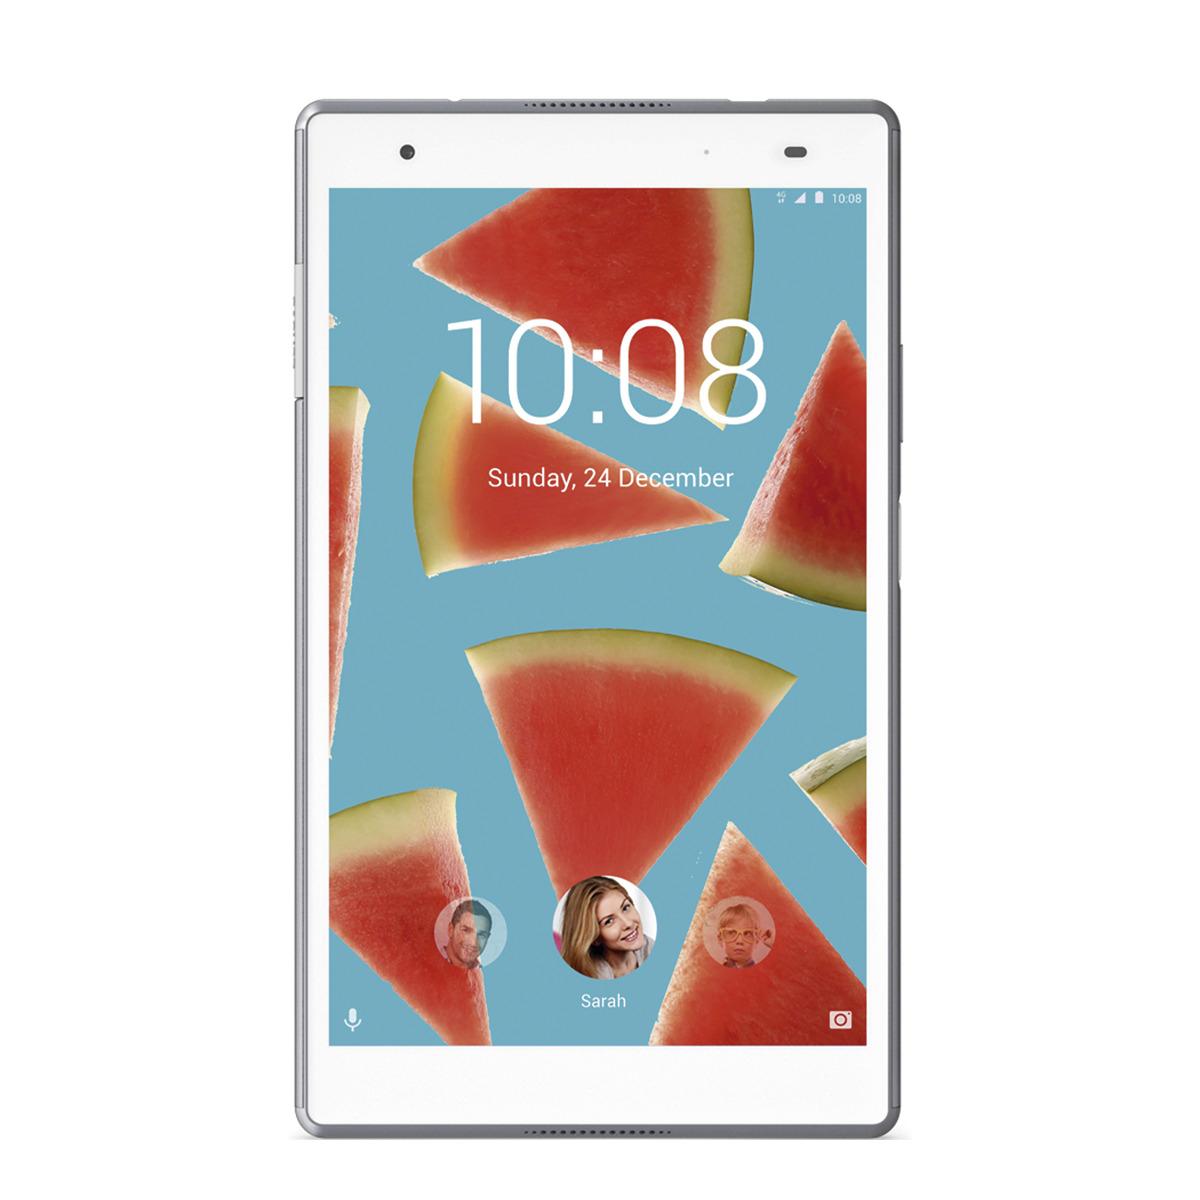 "Tablet Lenovo Tab 4 8 Plus (Reacondicionado casi a estrenar) LTE 20,32 cm (8"") 64 GB Wi-Fi"